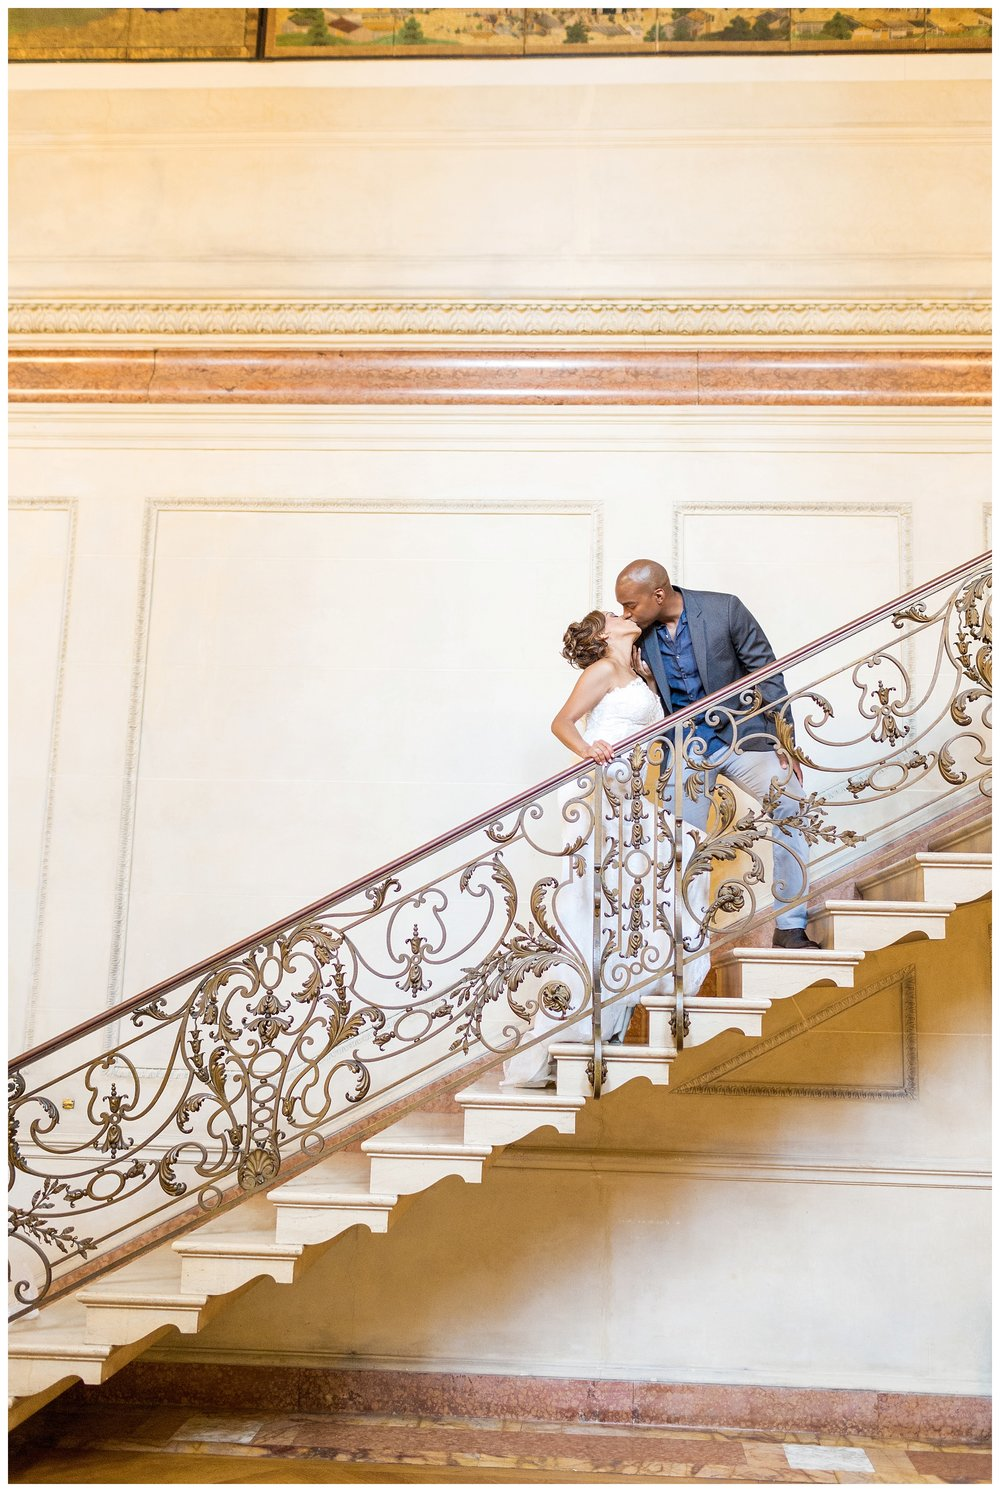 Anderson House Wedding DC Wedding Photographer Kir Tuben_0049.jpg